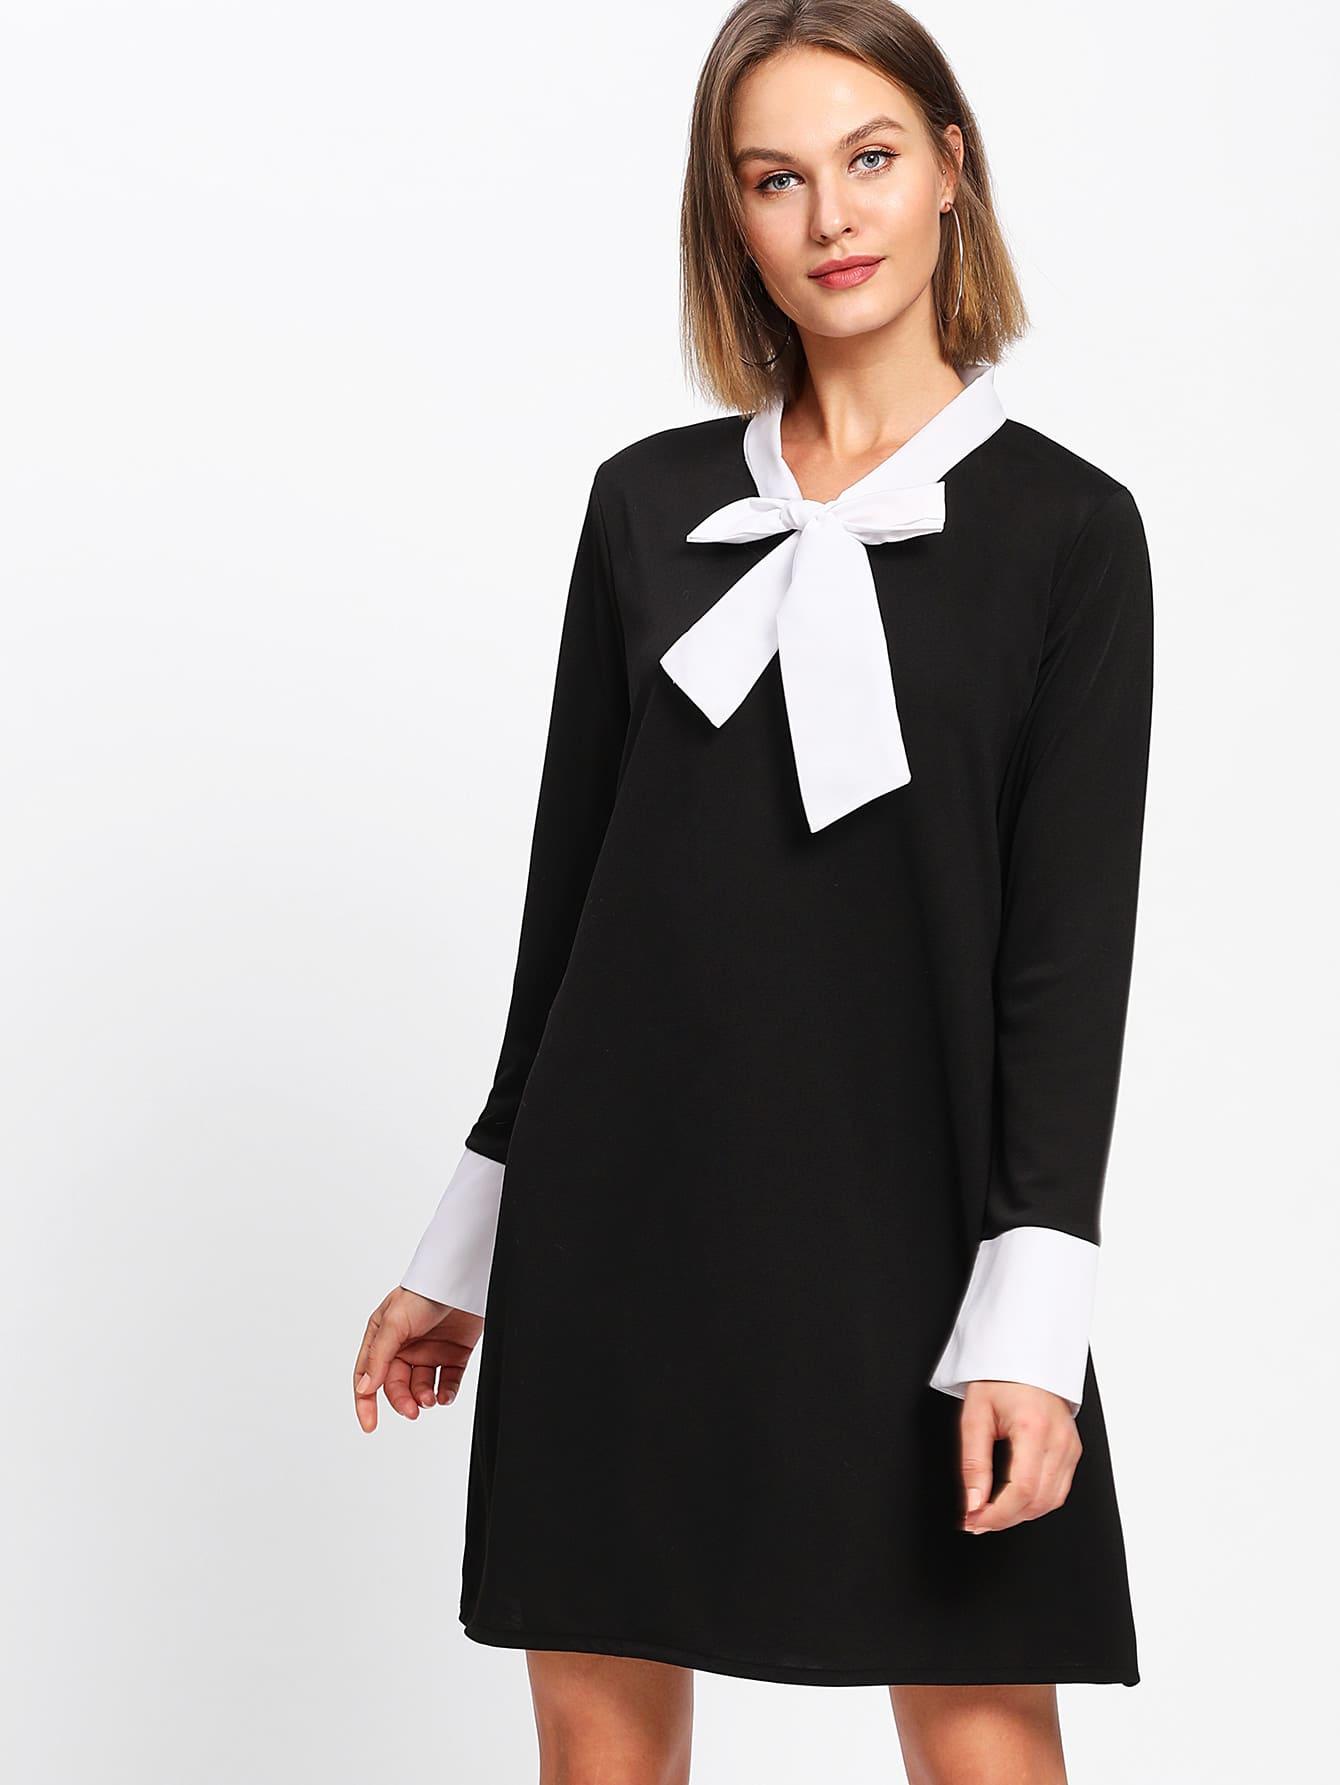 Contrast Self Tie Neck Shift Dress contrast tie neck faux pocket tweed dress